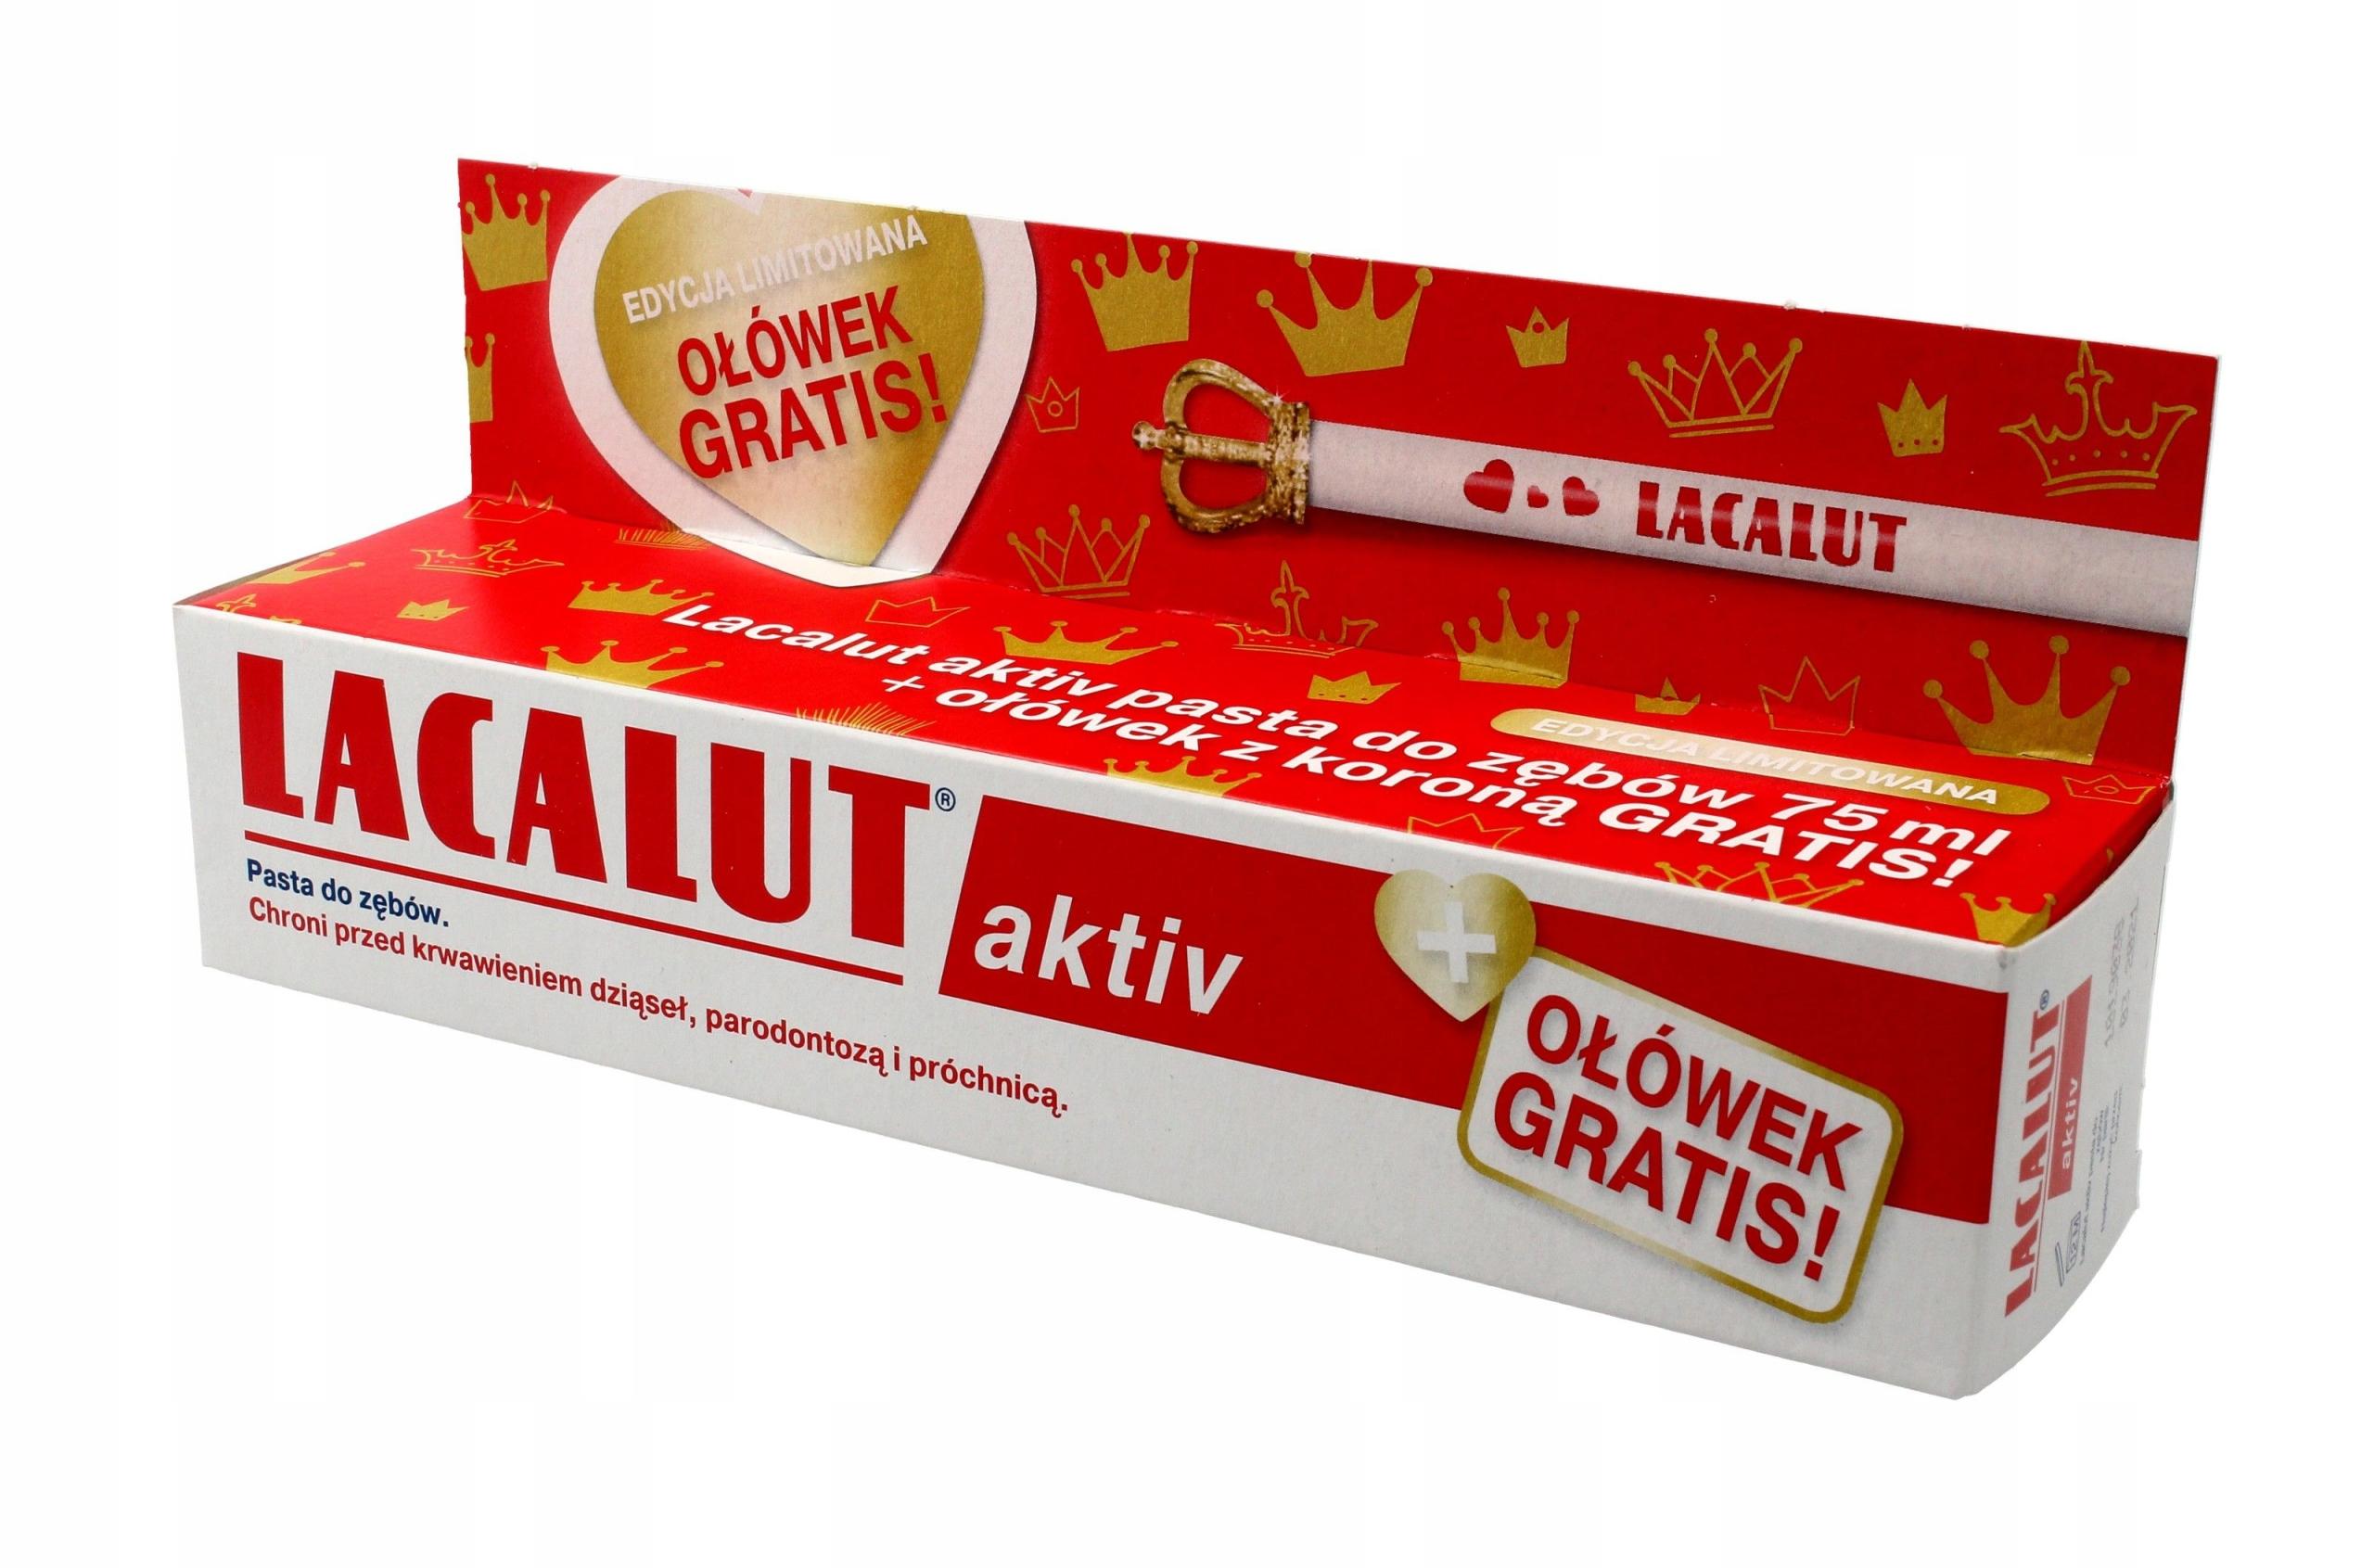 Lacalut Pasta do zębów Activ paradontoza 75ml + oł